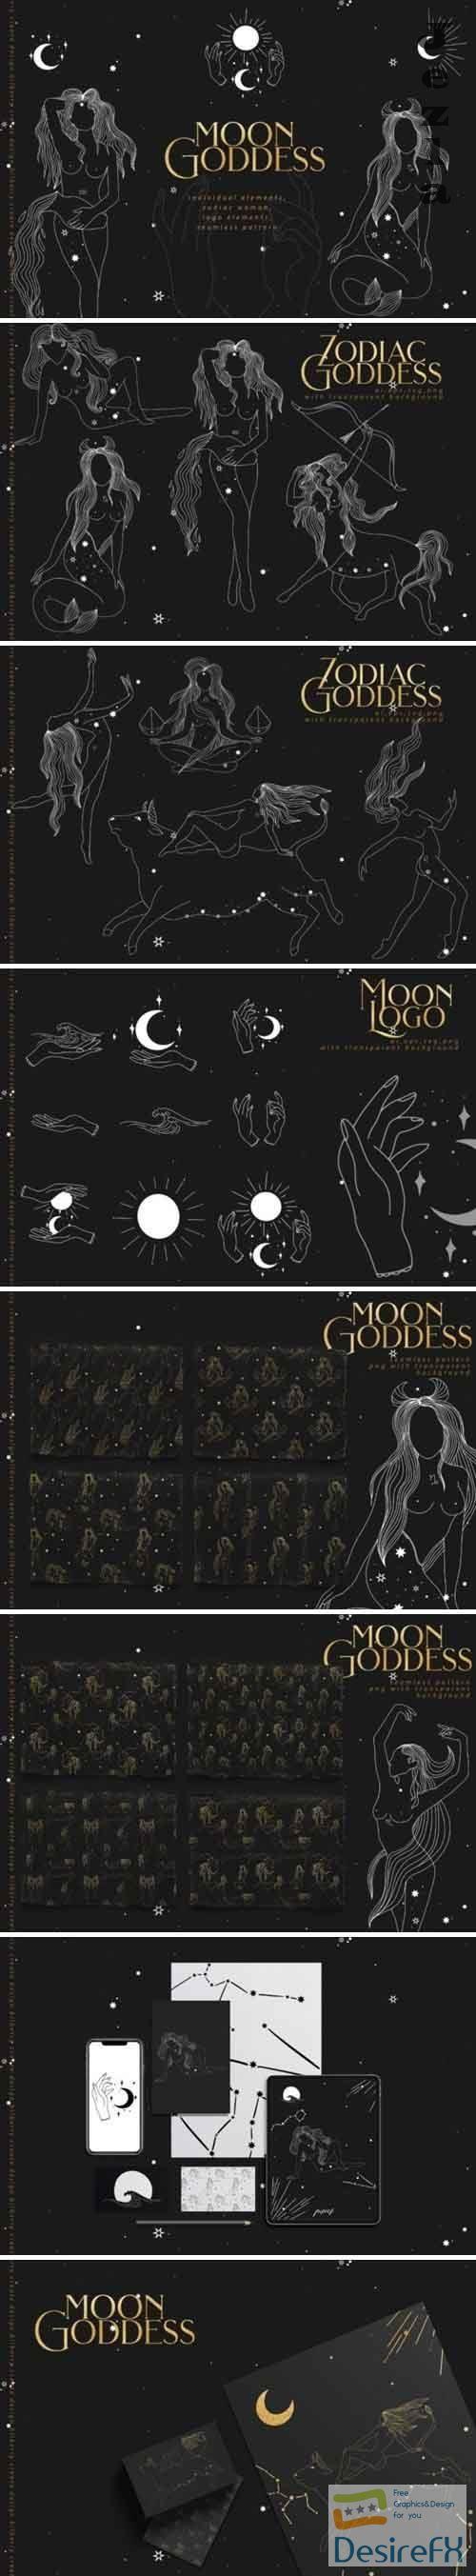 Moon Goddess - 5106457